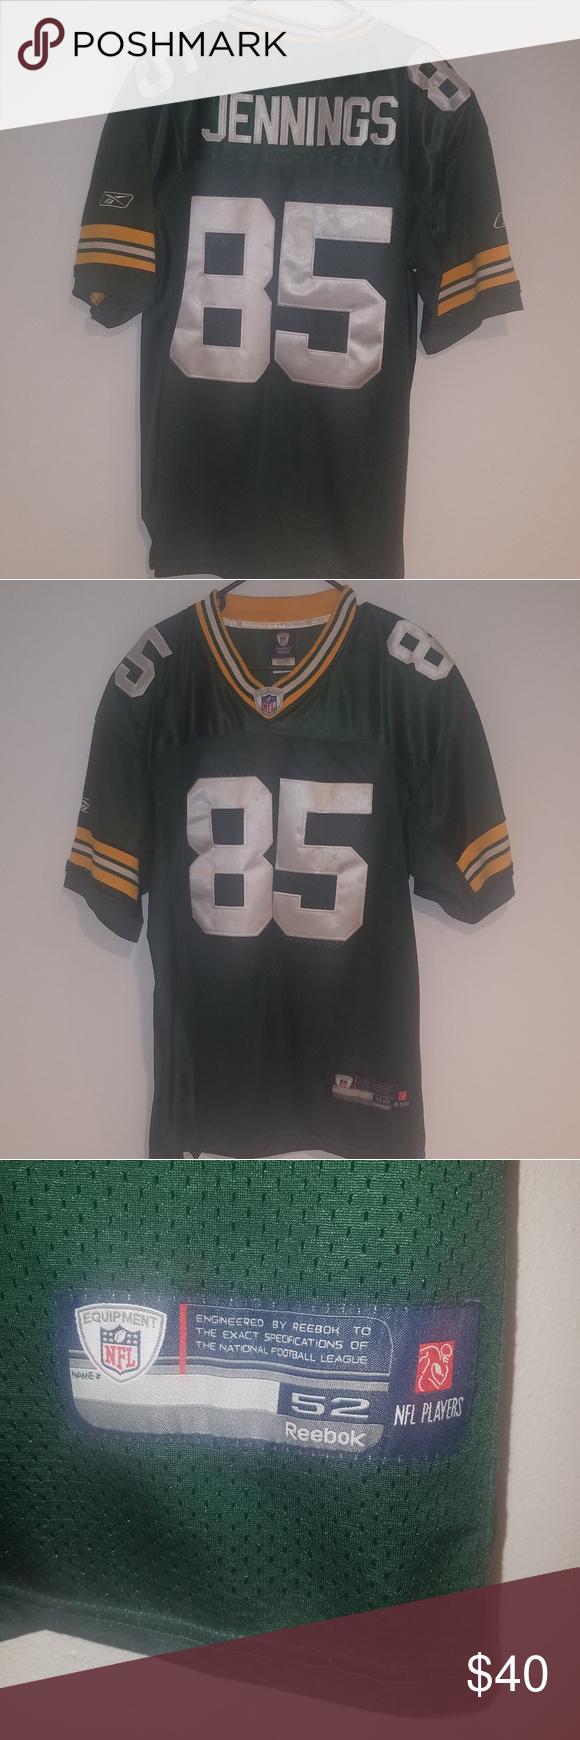 Green Bay Packers Jersey 85 Jennings Size 52 Green Bay Packers Jerseys Clothes Design Green Bay Packers